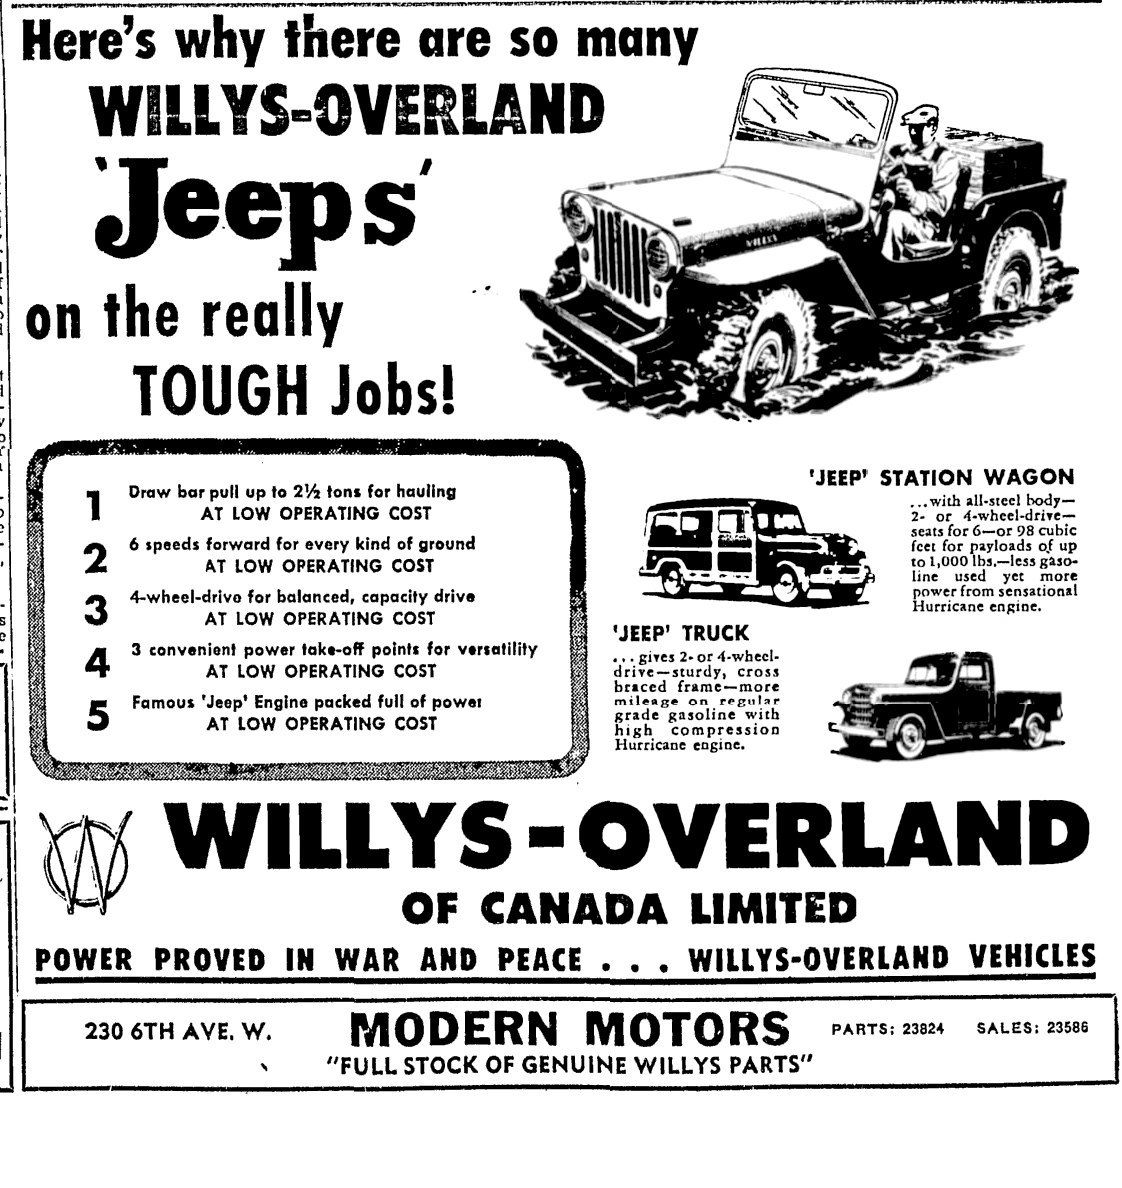 What Makes A Willys Cj 3a So Tough